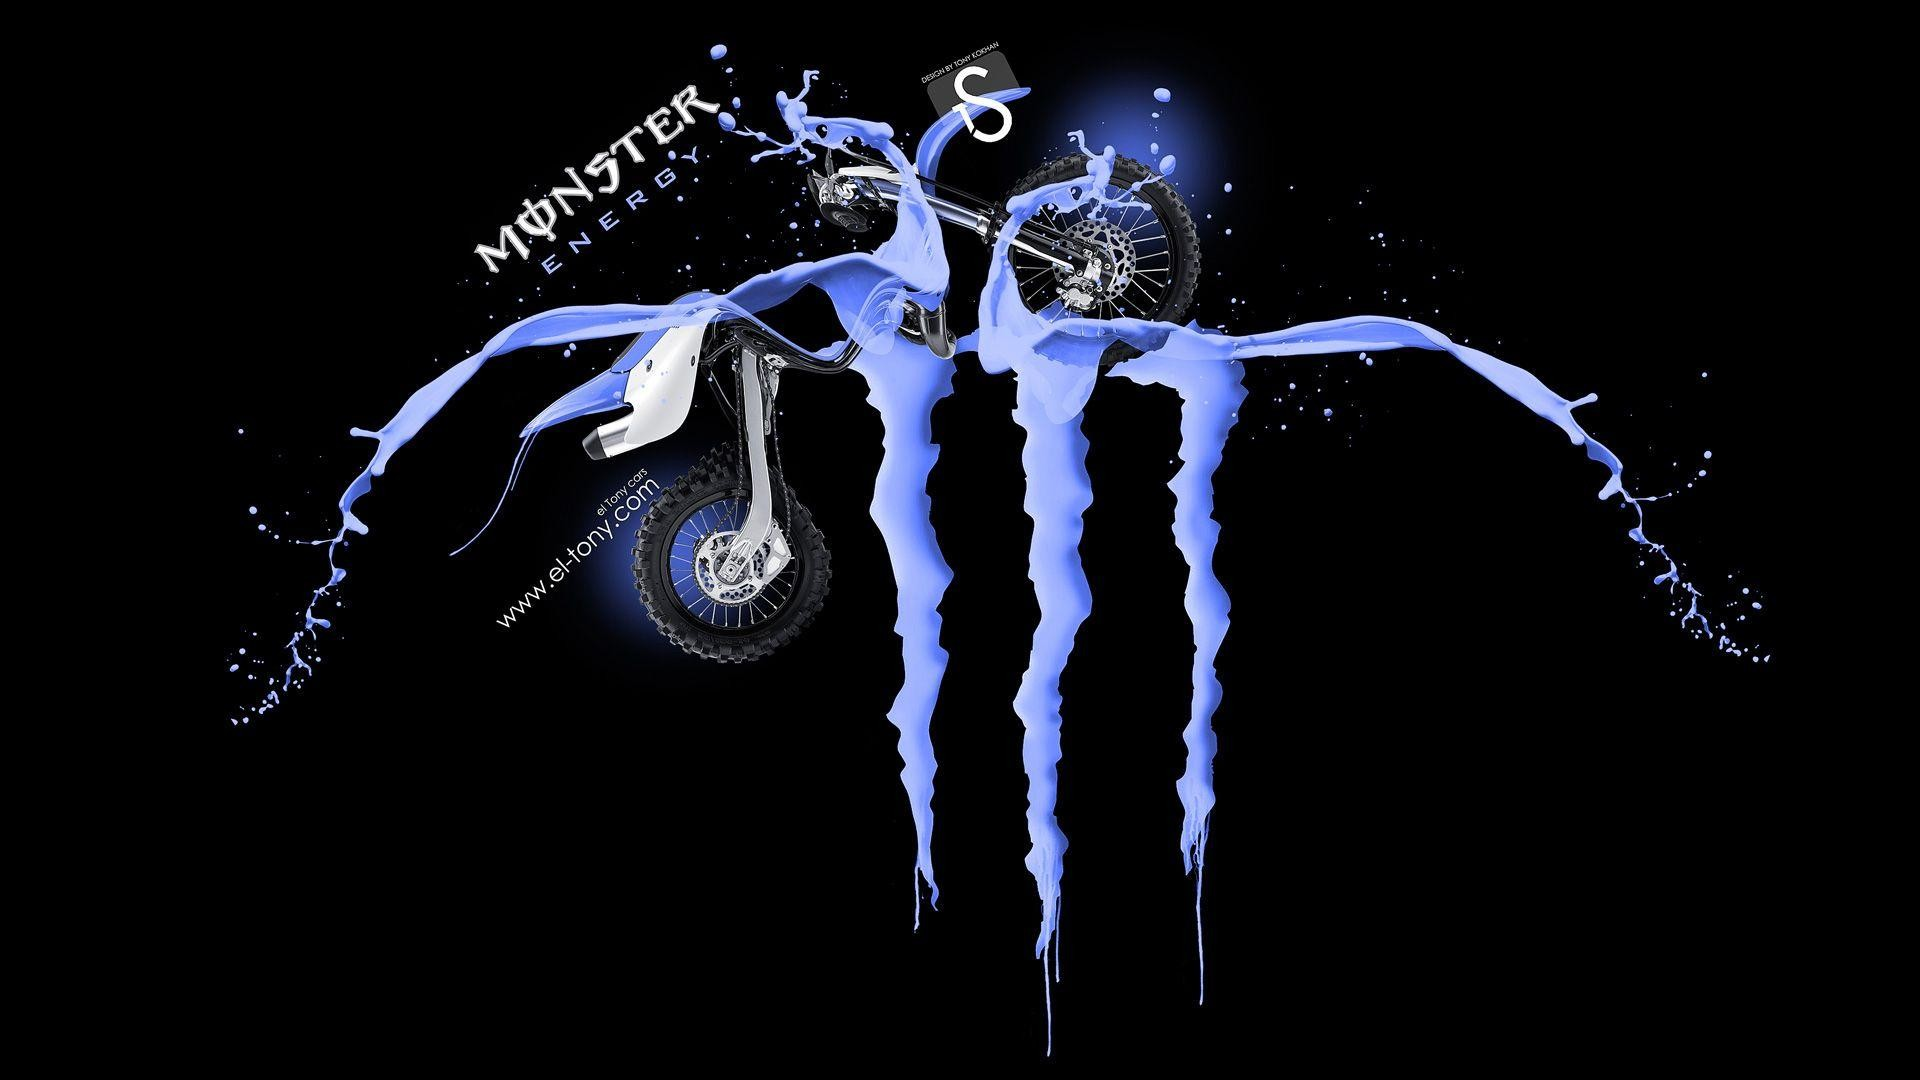 1920x1080 Monster Energy Logo Blue Fantasy Wallpaper #2875 Wallpaper | Wall  .